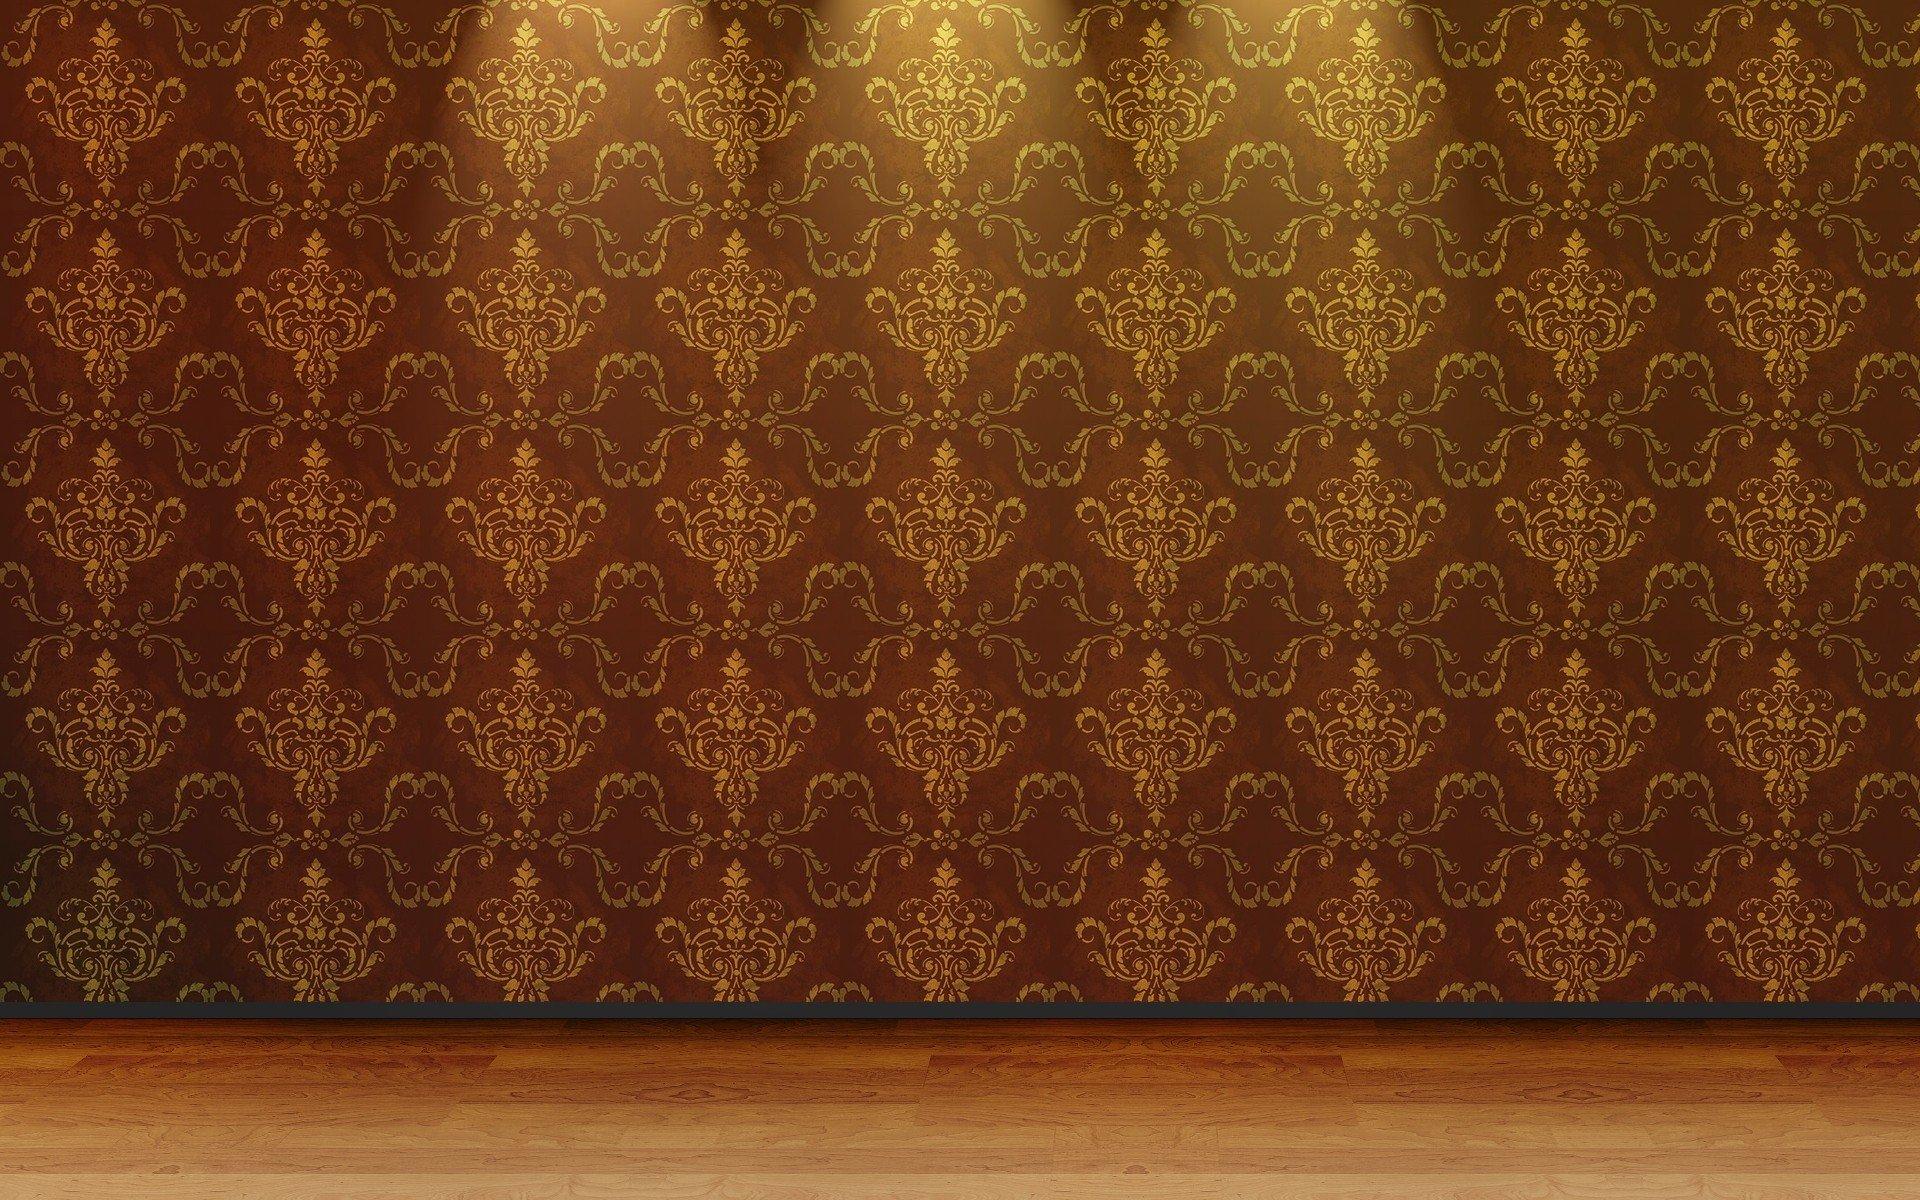 3D Wallpaper 1920x1200 Floor 3D View Wall Room Patterns Wood 1920x1200